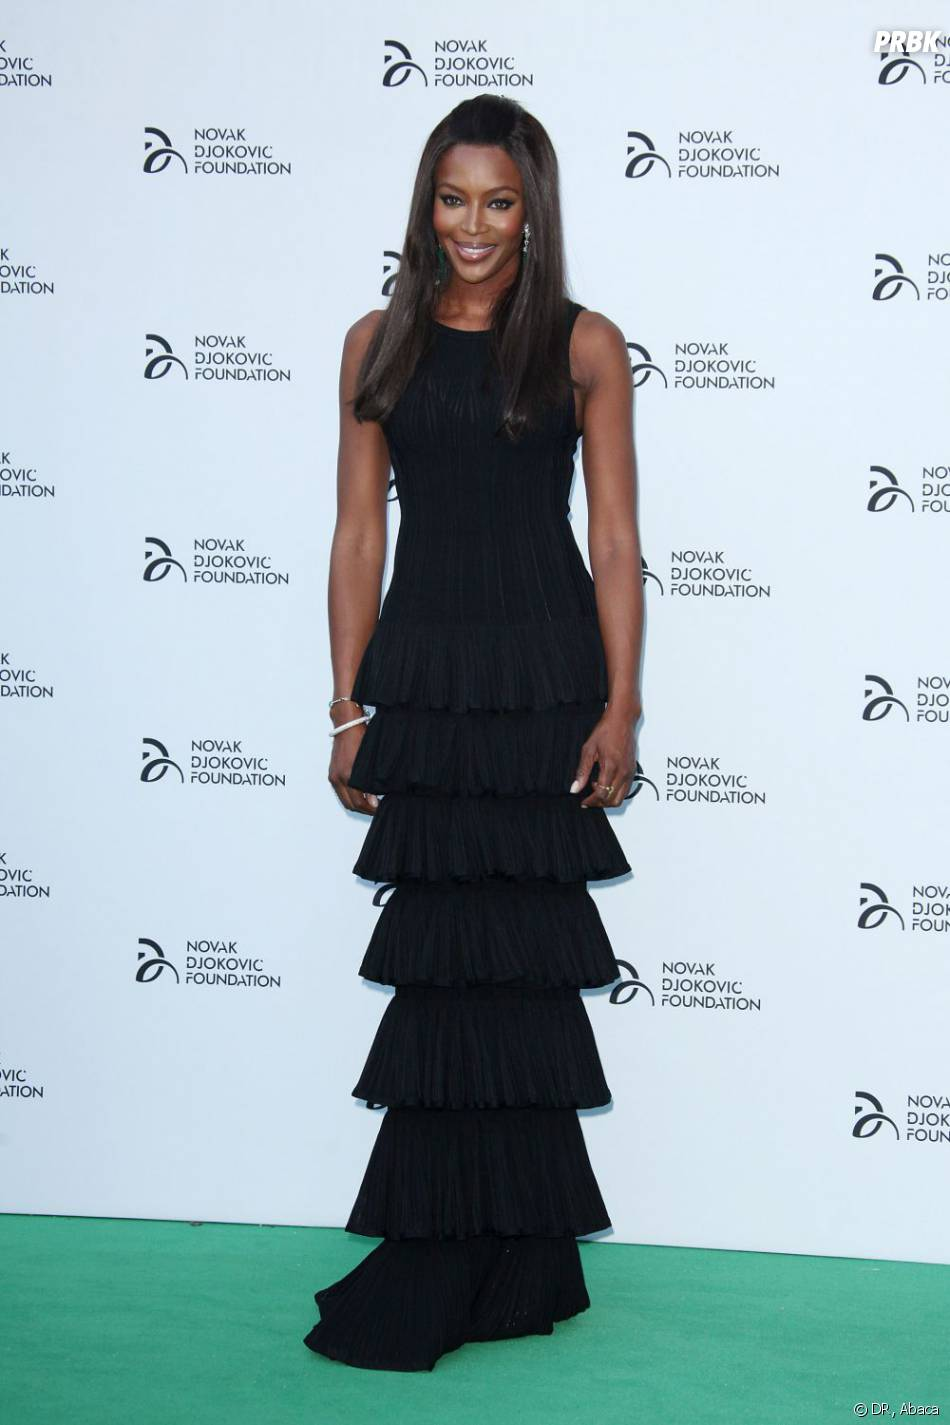 Naomi Campbell resplendissante lors du dîner caritatif de Novak Djokovic à Londres le 8 juillet 2013.